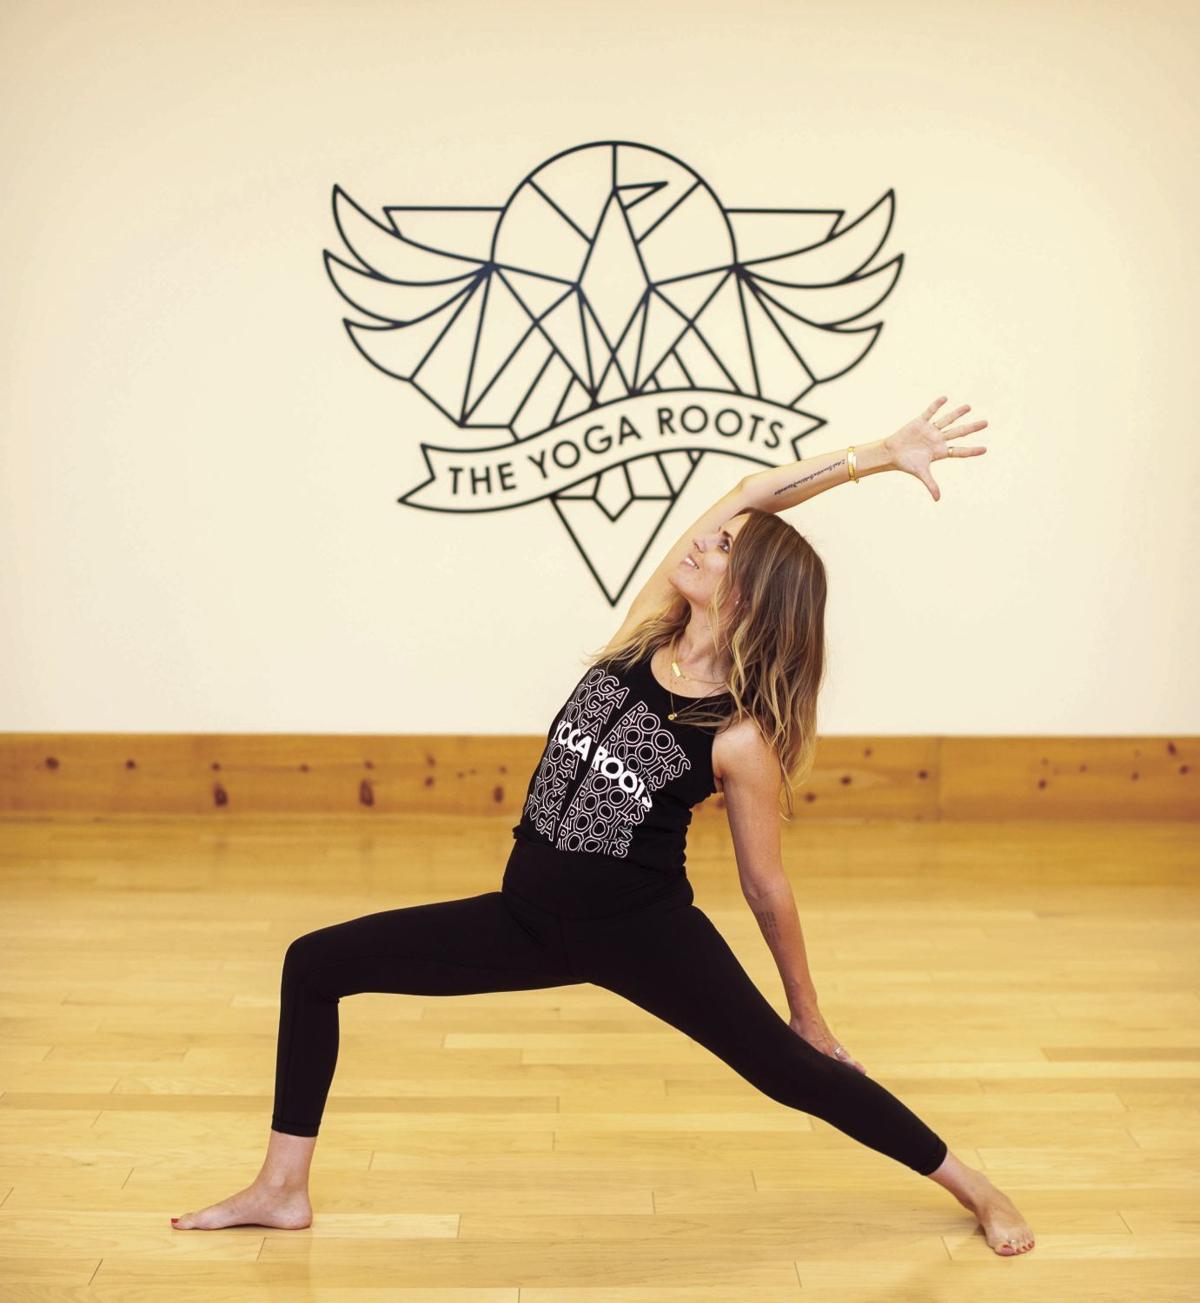 The Yoga Roots (copy)